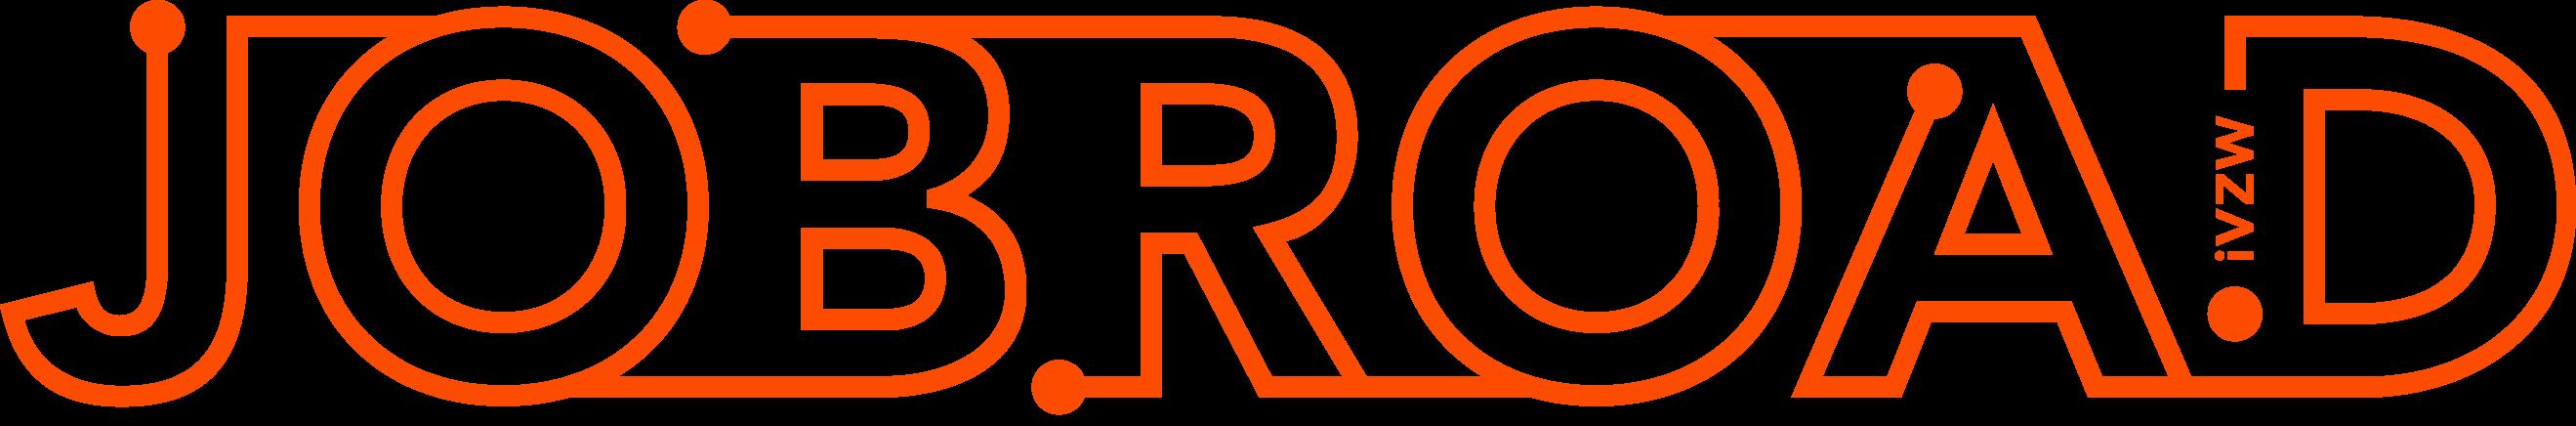 JobRoad - logo